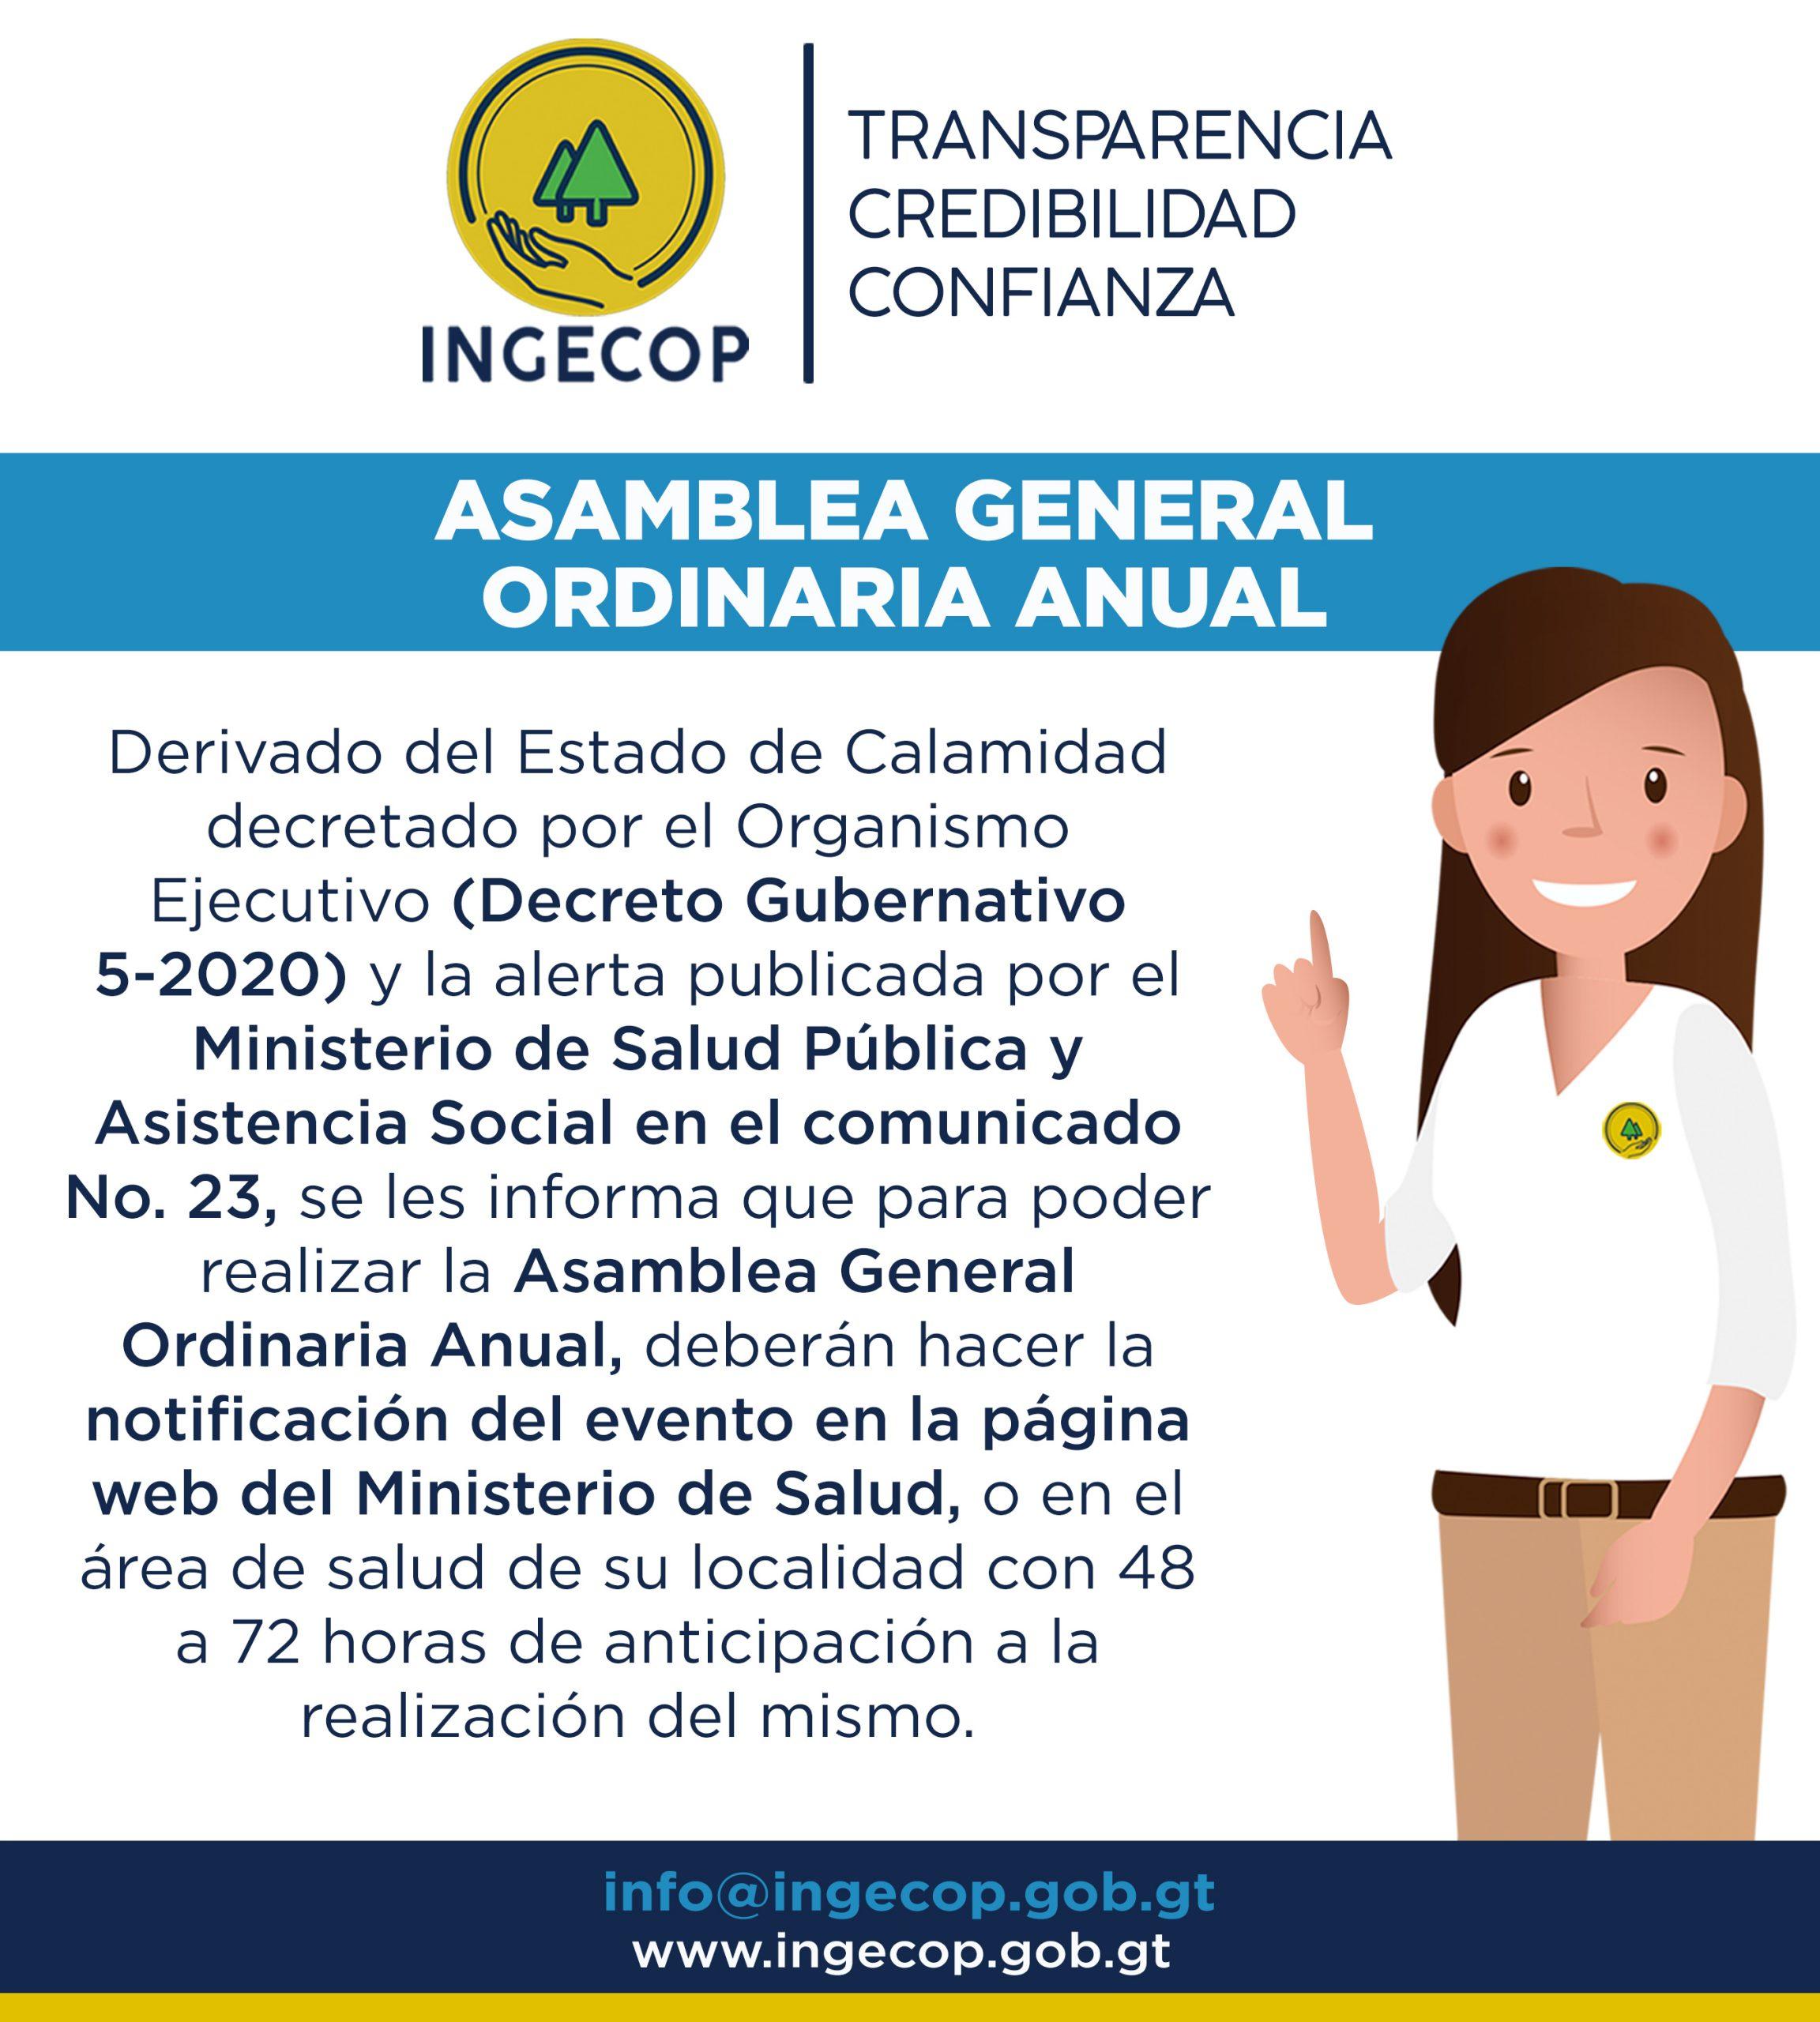 Asamblea General Ordinaria Anual